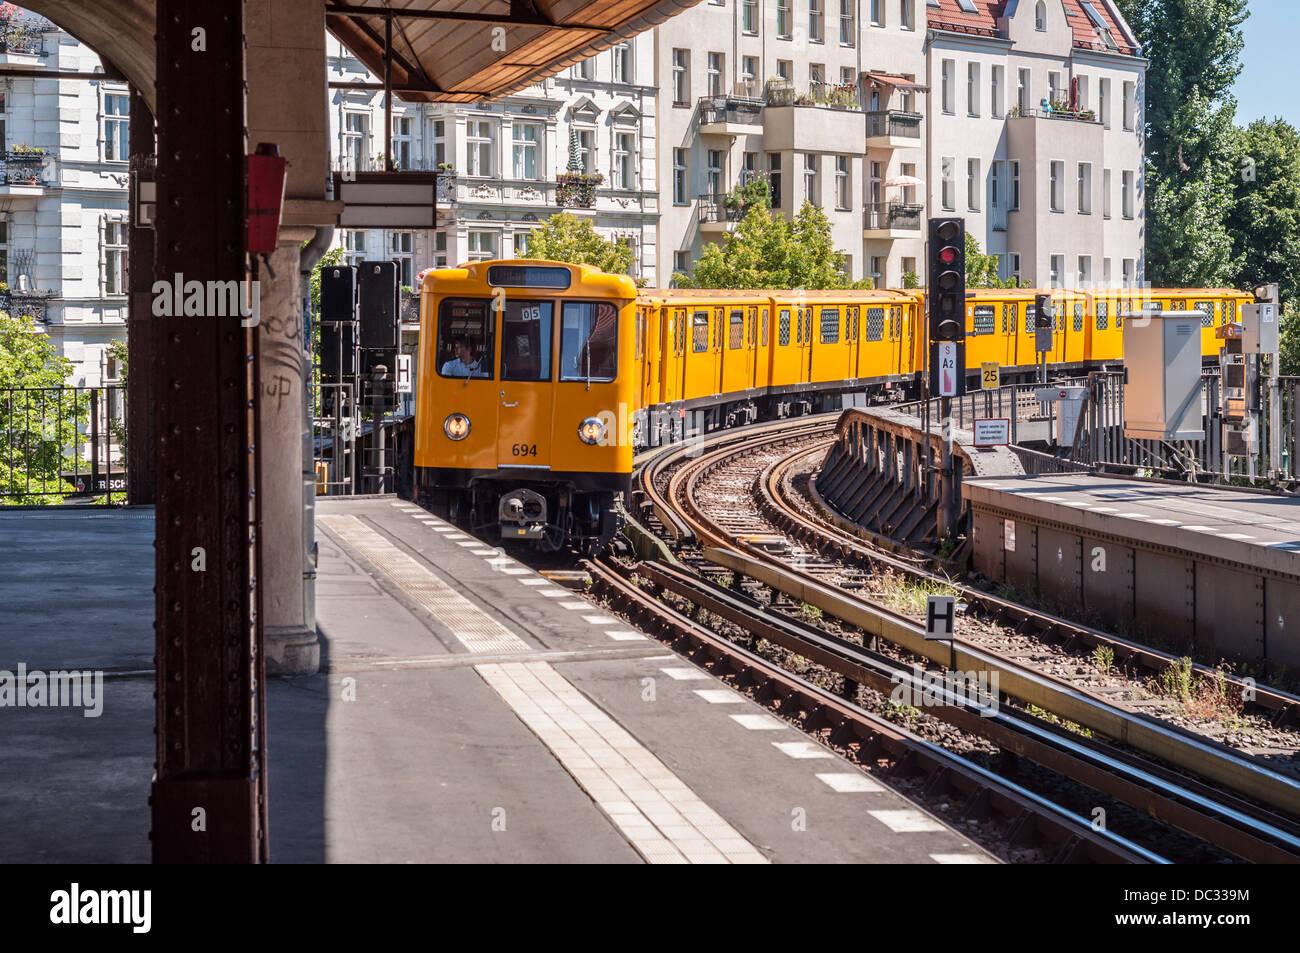 Berlin Germany - Commuter train approaching railway station Stock Photo